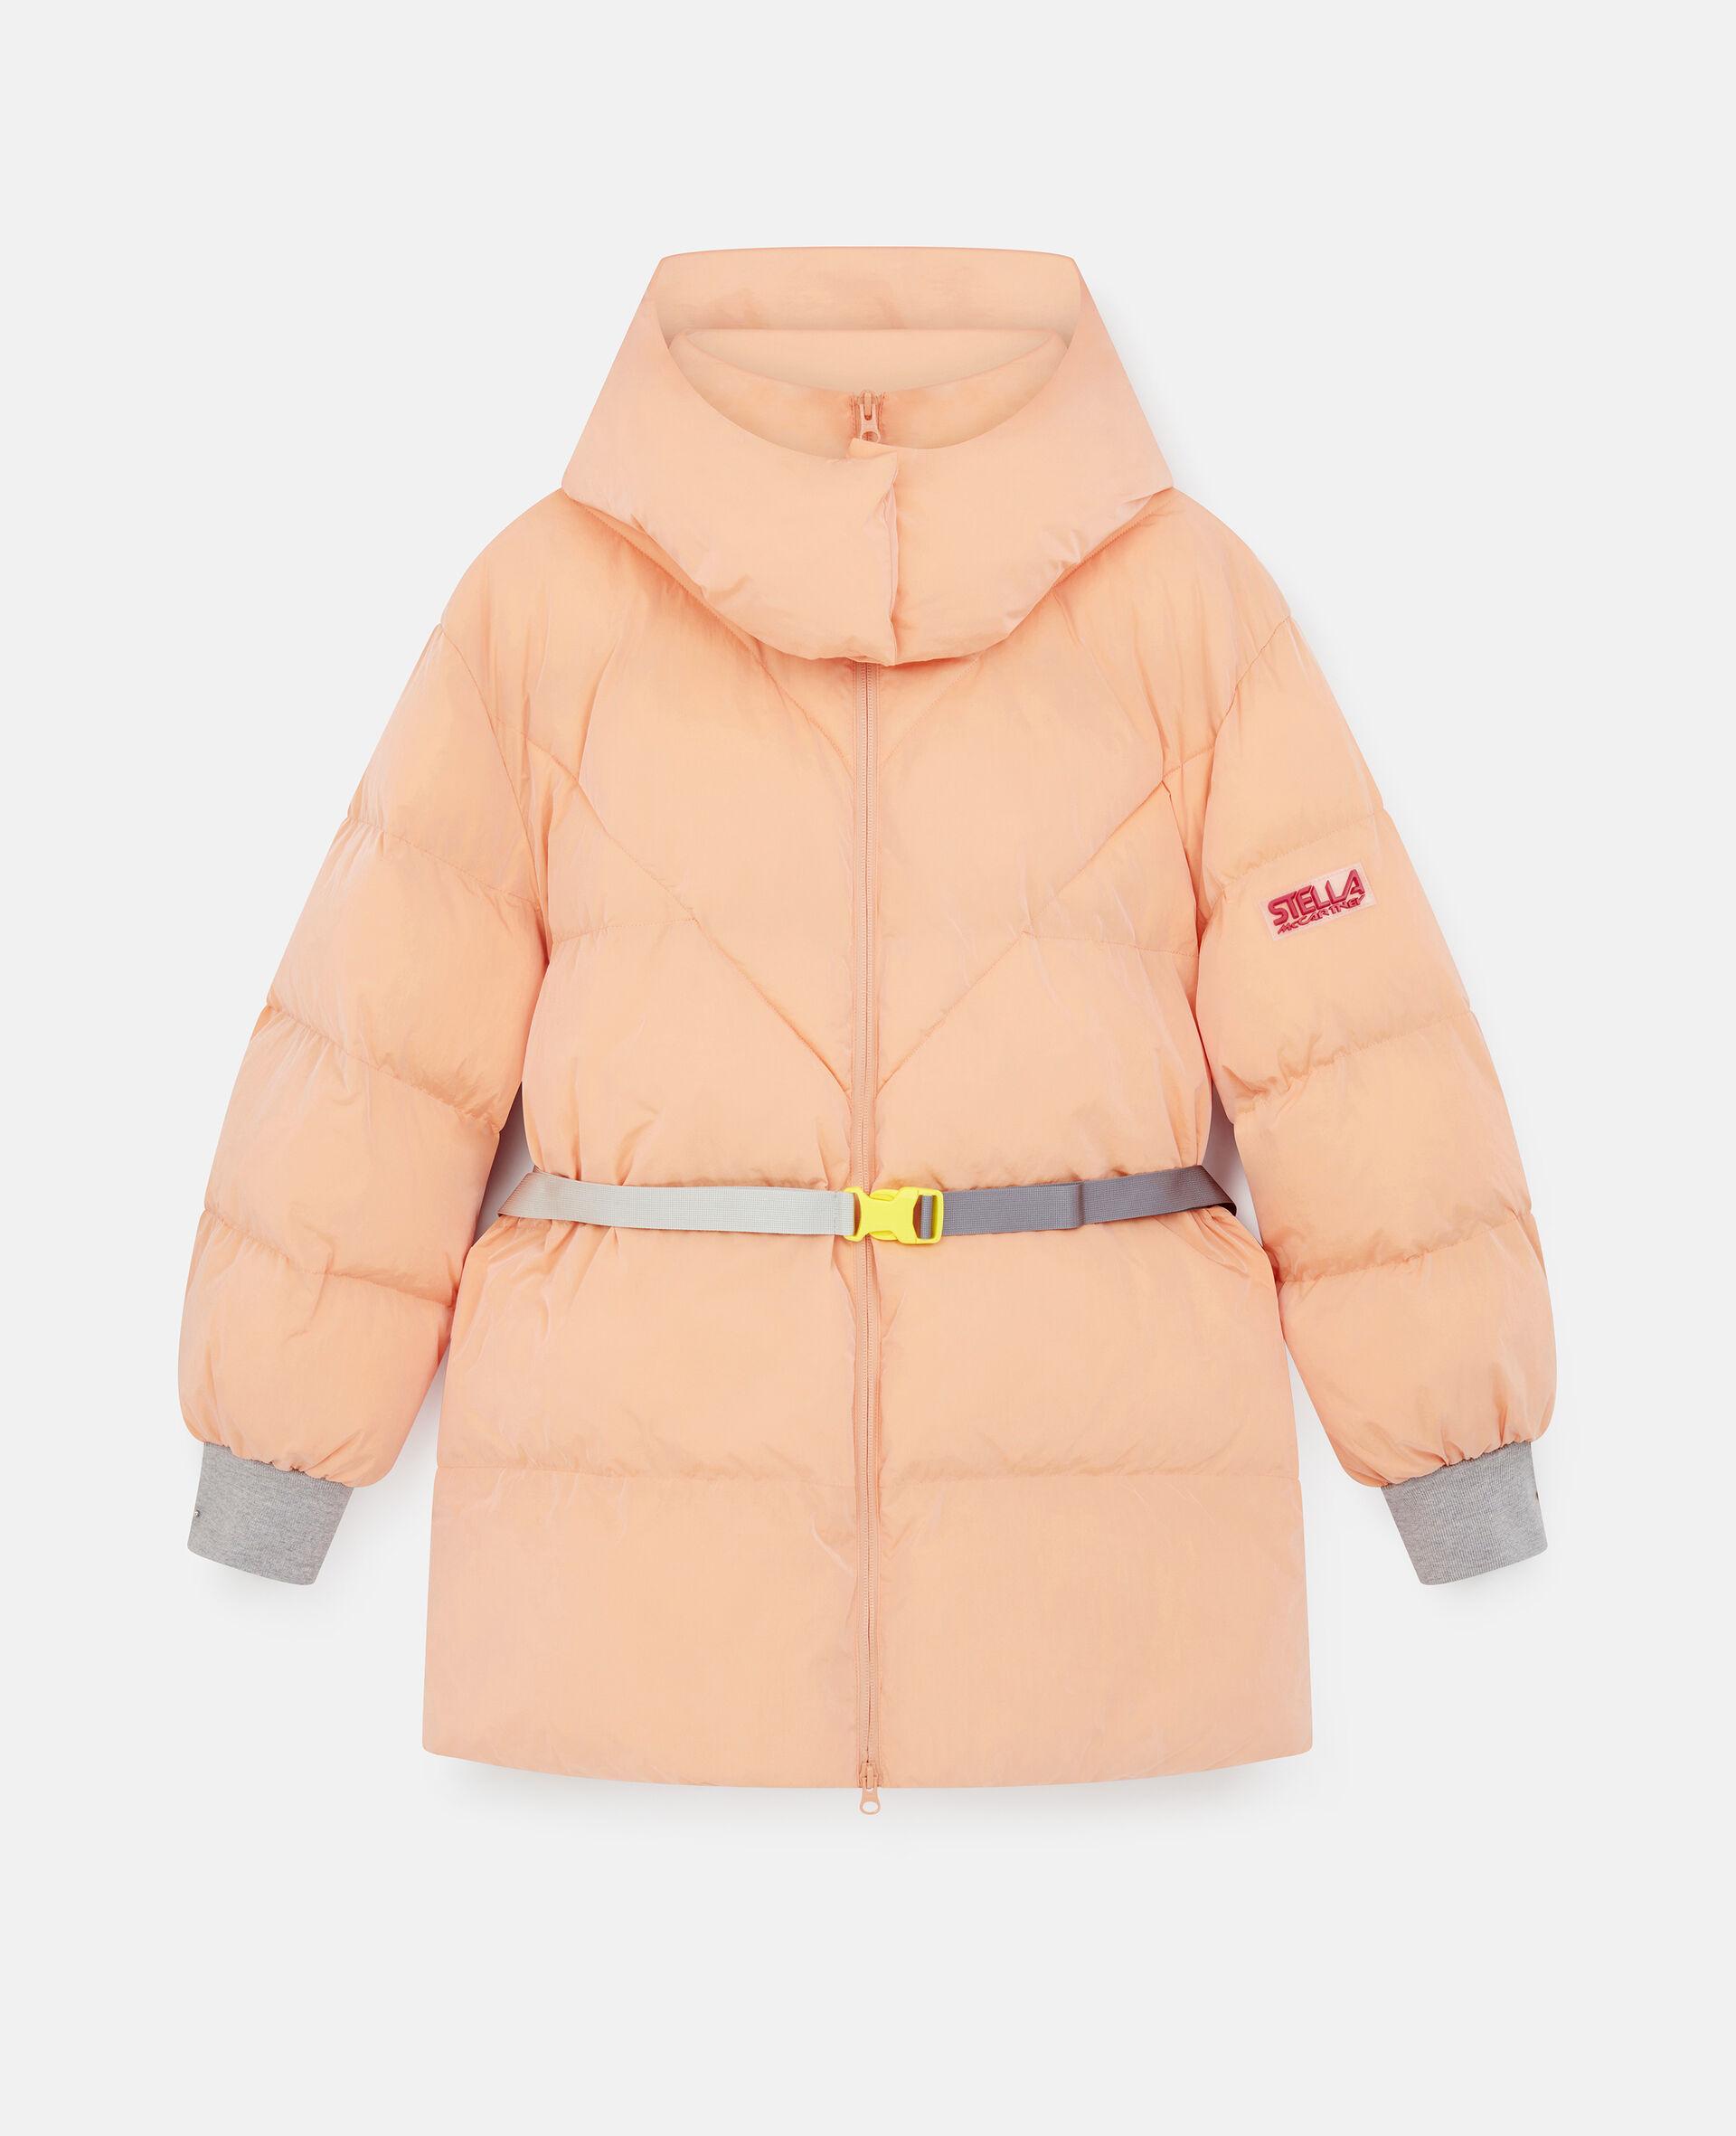 Kayla Quilted Puffer Jacket-Orange-large image number 0